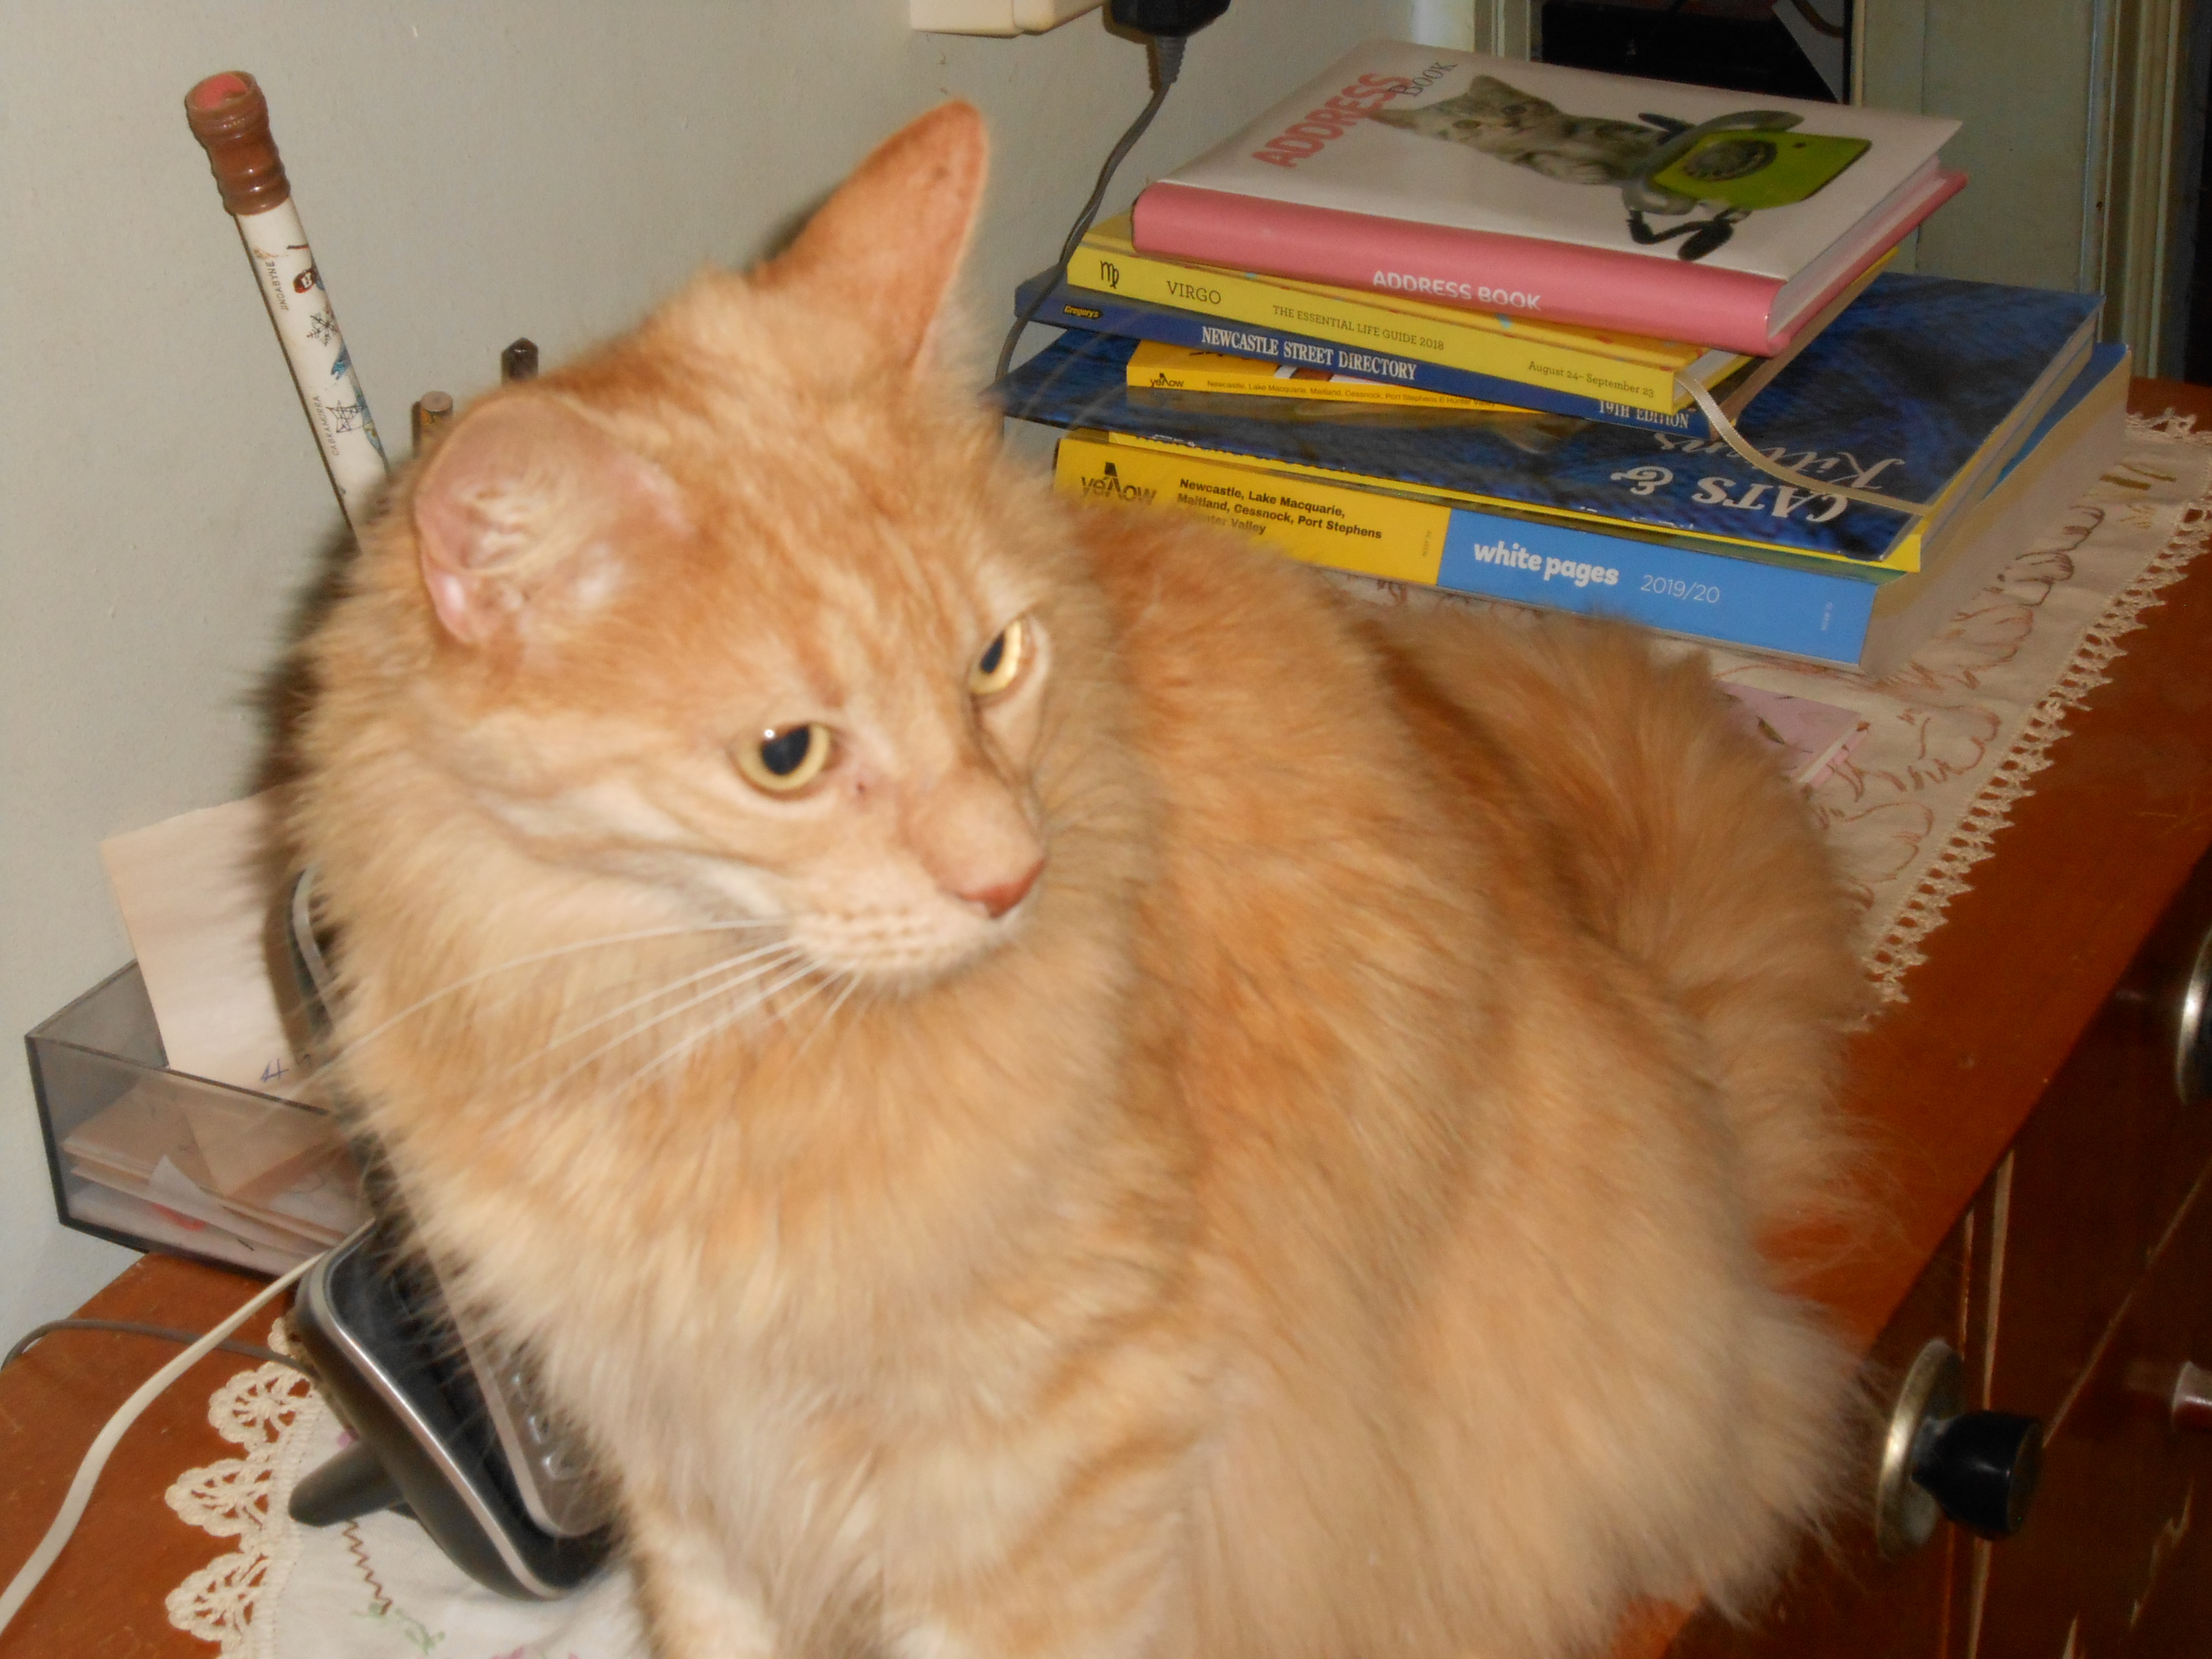 Download Adorable Cat Pictures Photos Images vCHWHvv1h